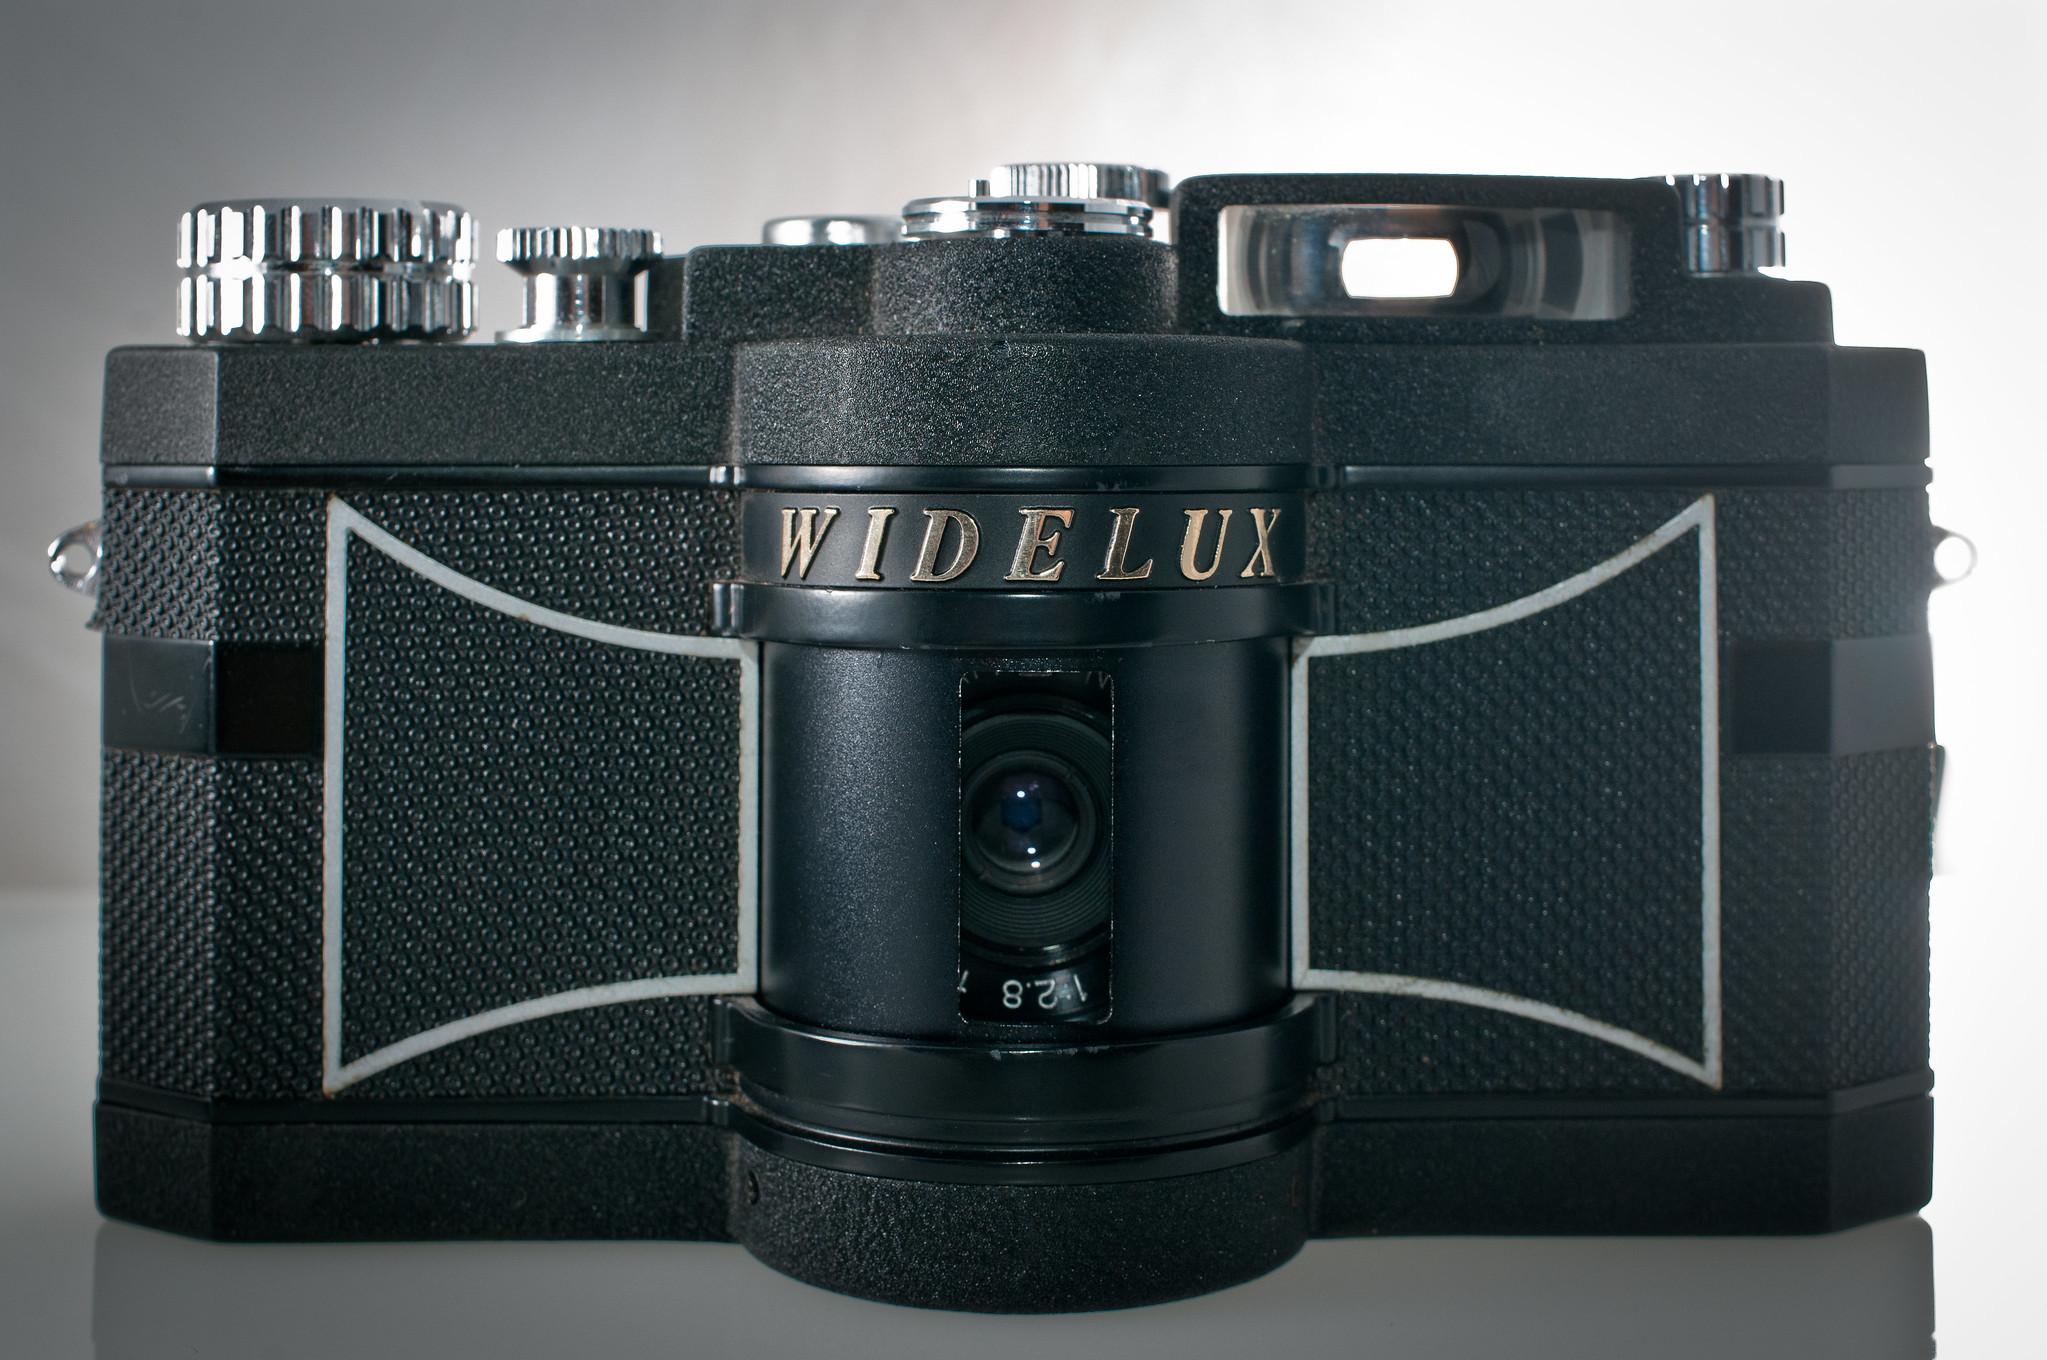 Widelux camera (Pic: Brendan Lynch/Flickr)